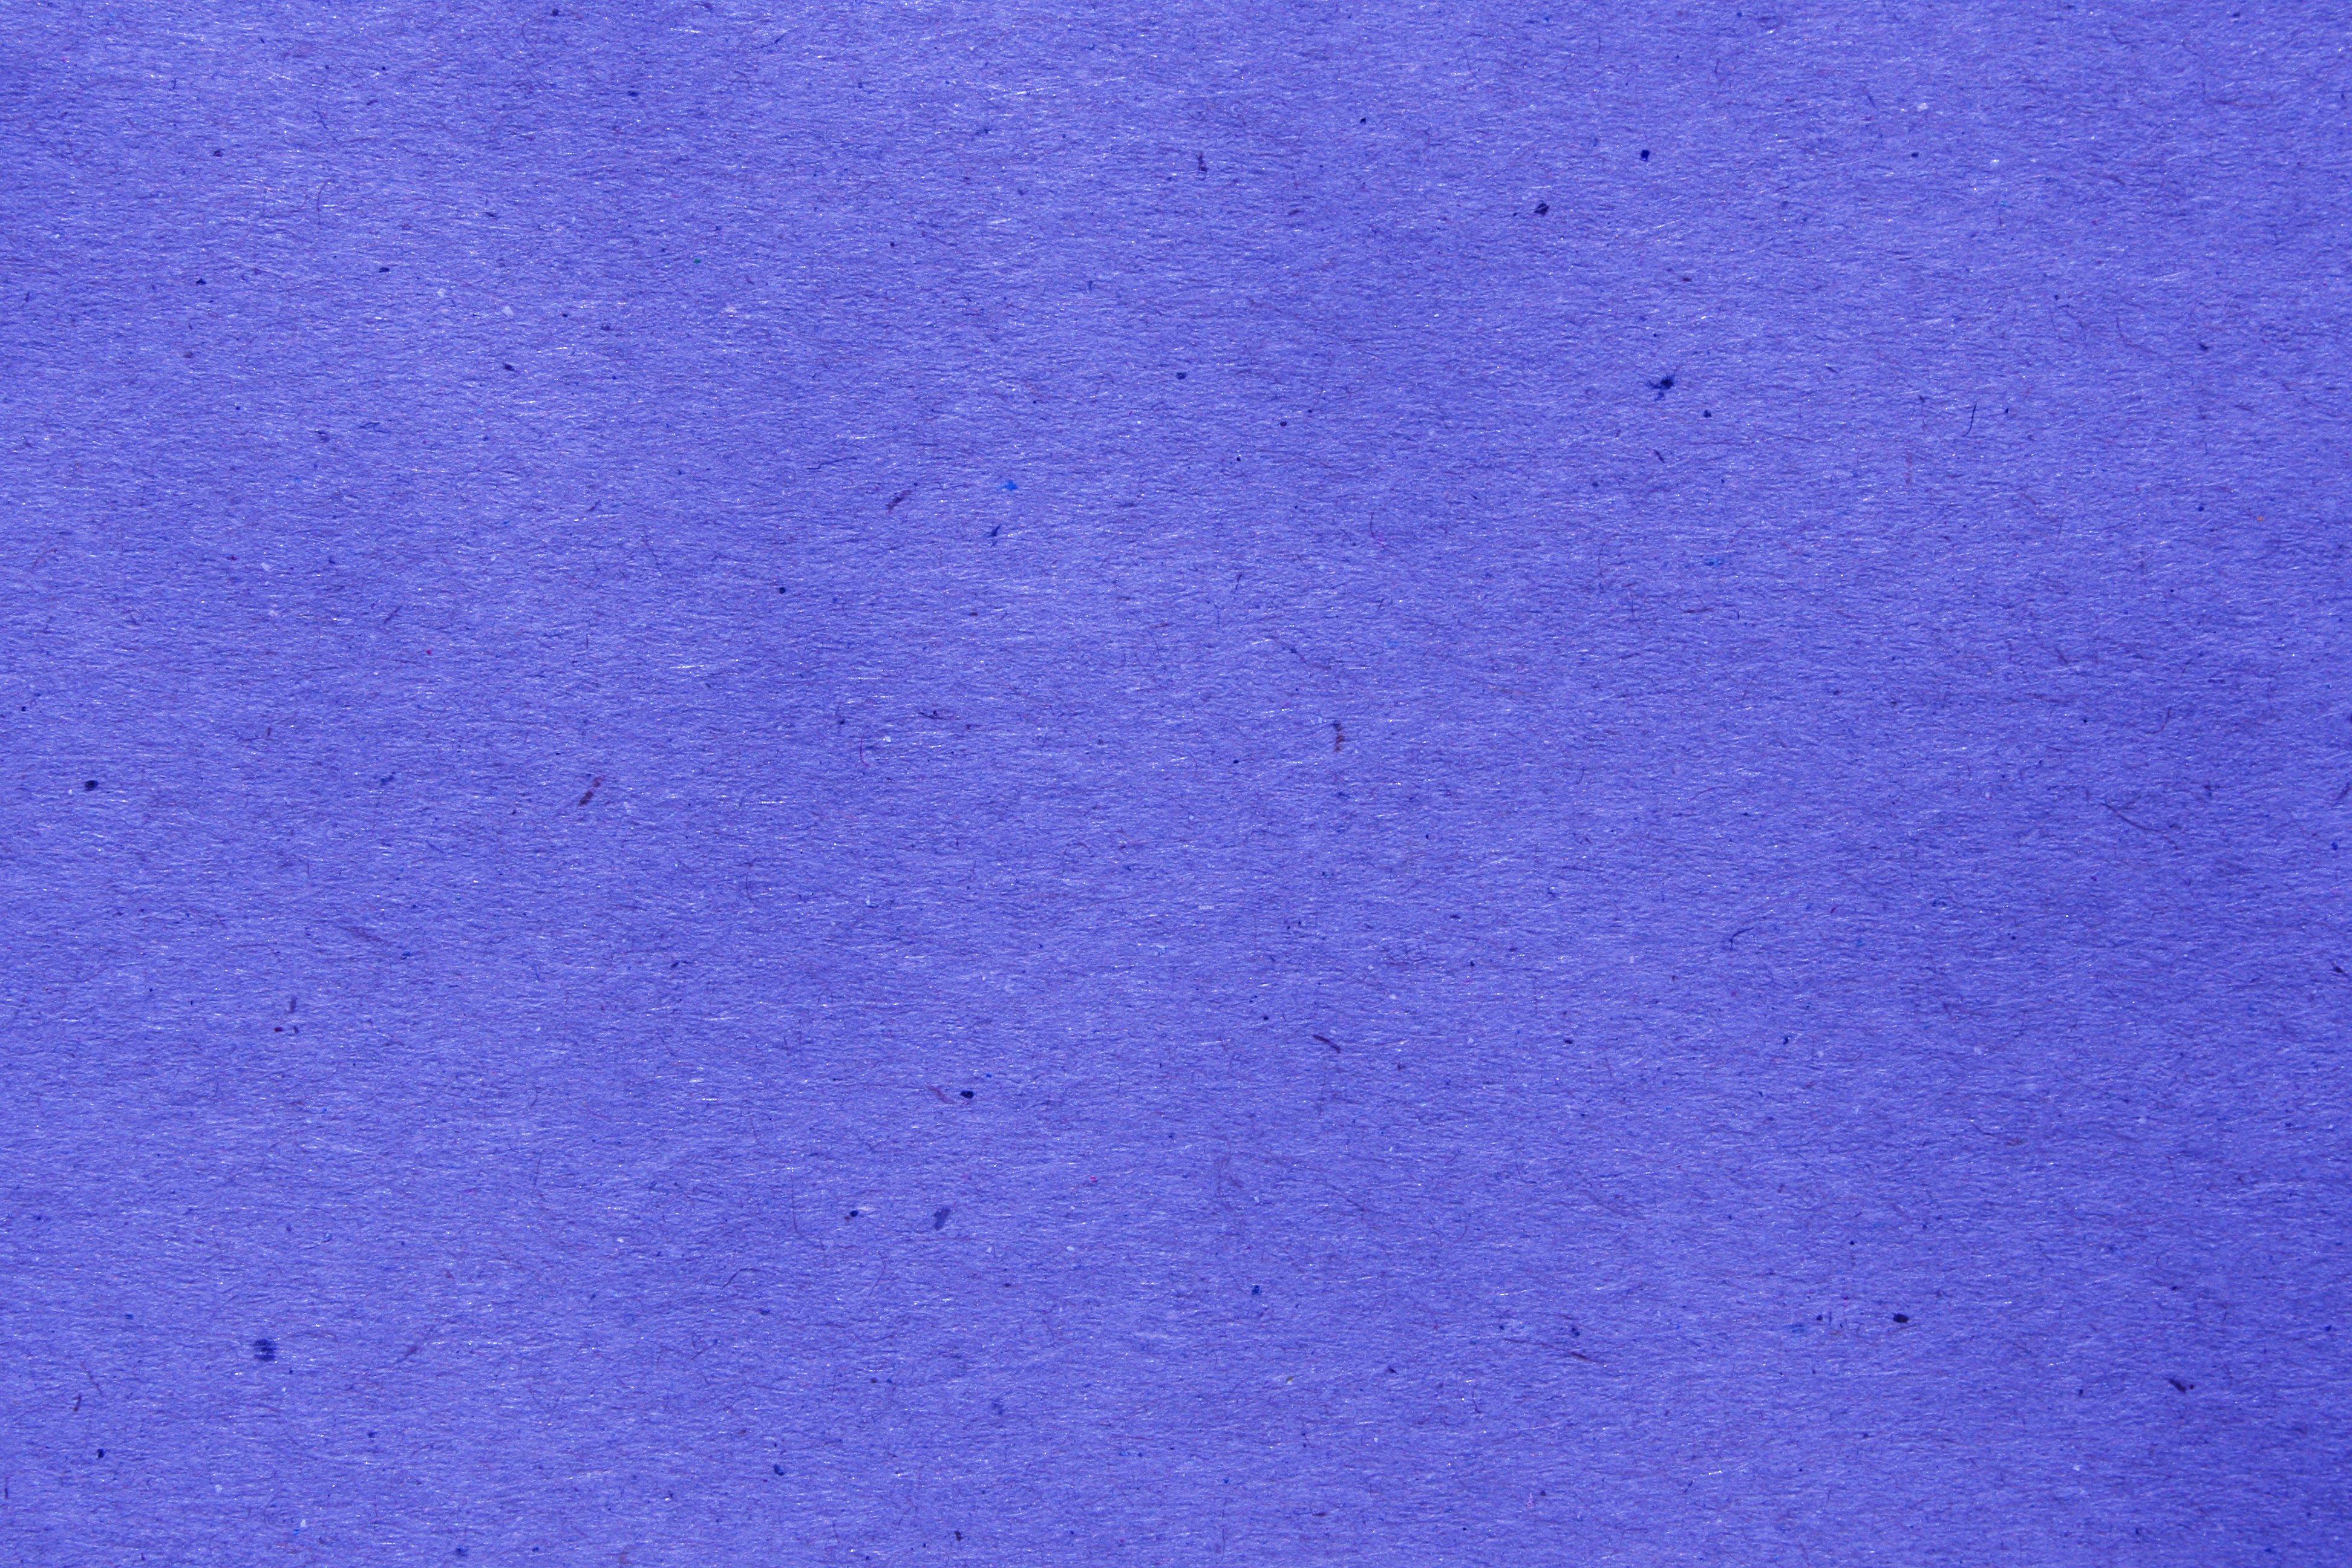 indigo blue paper texture with flecks picture free